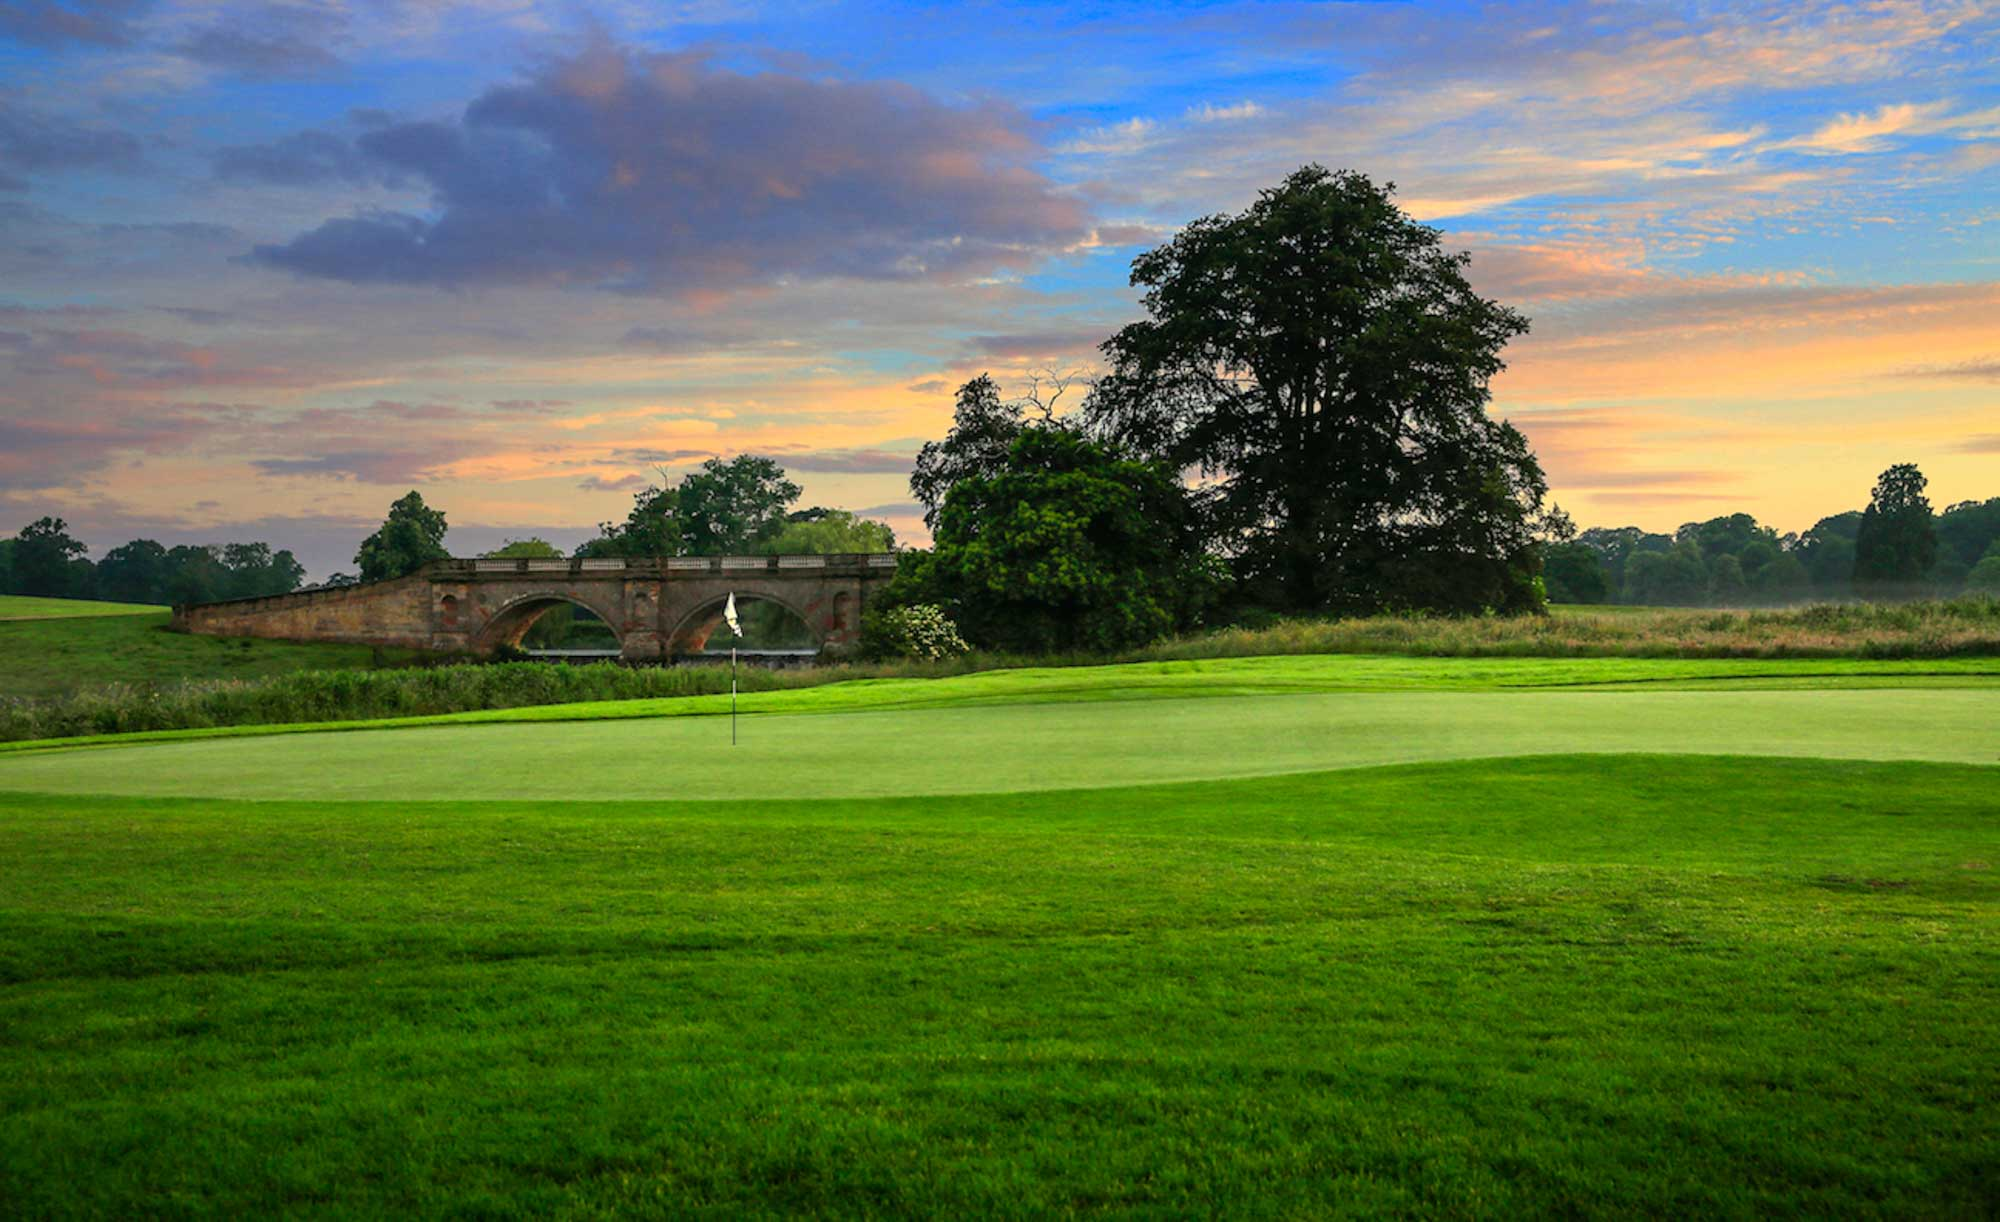 The Adams Bridge as seen from the Kedleston Park Golf Club.